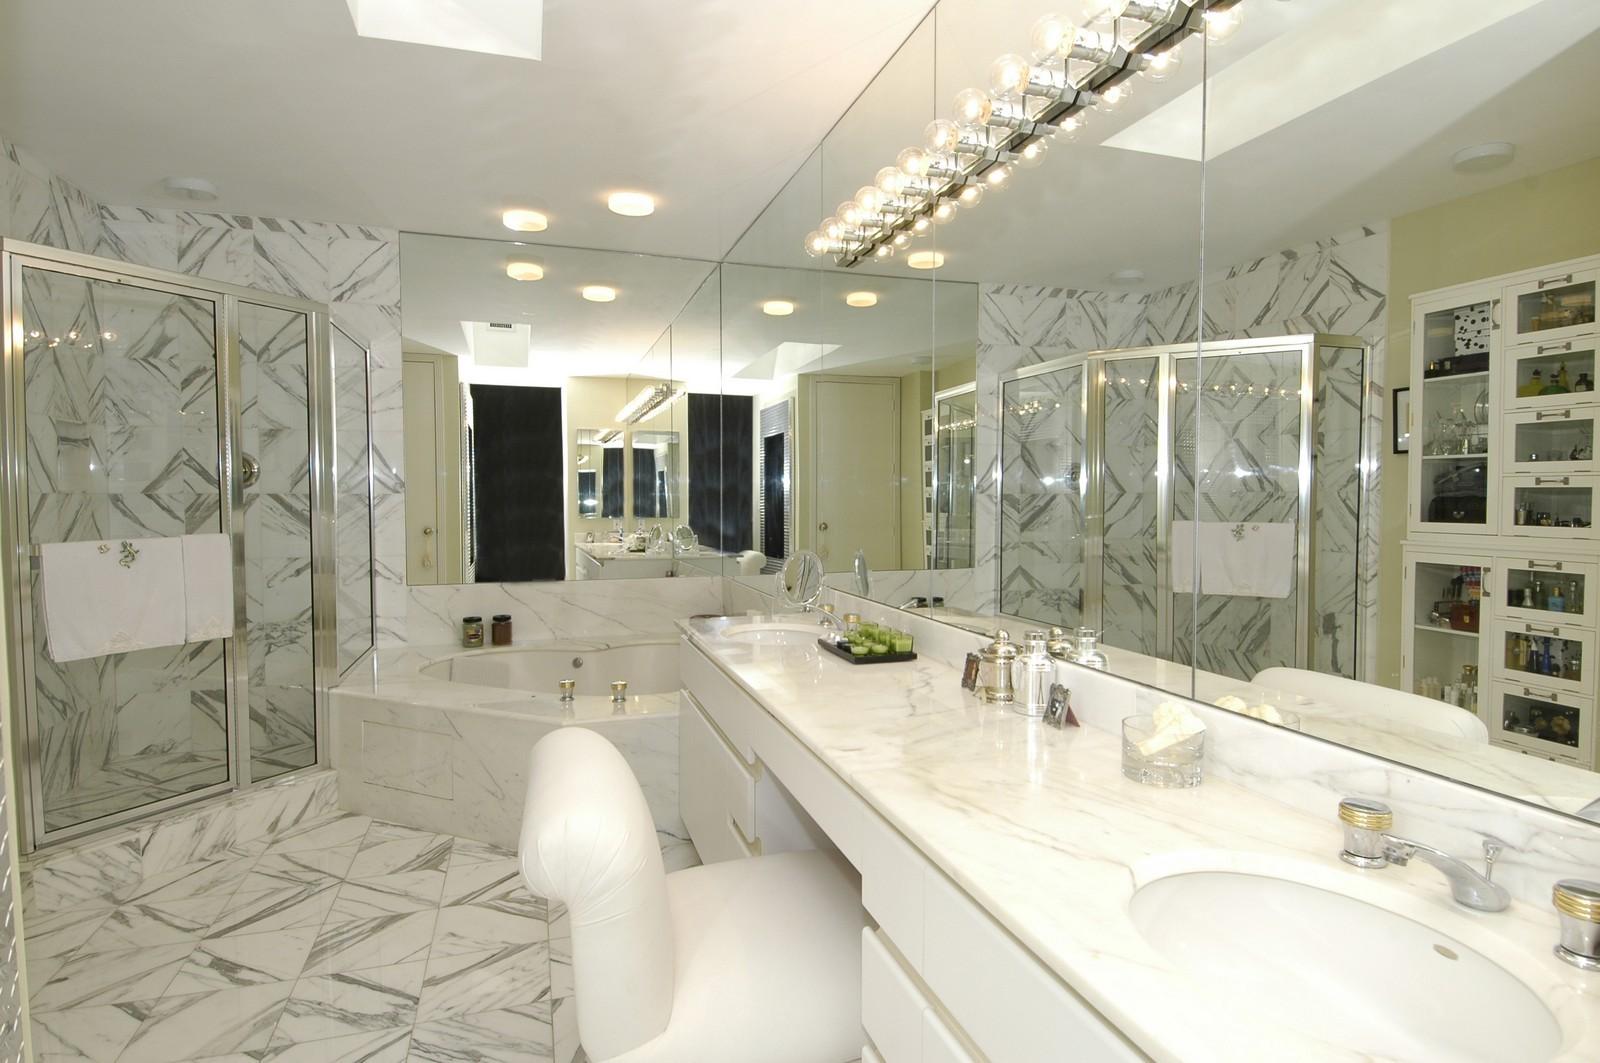 Real Estate Photography - 3685 NE 195 Ter, Aventura, FL, 33180 - Master Bathroom